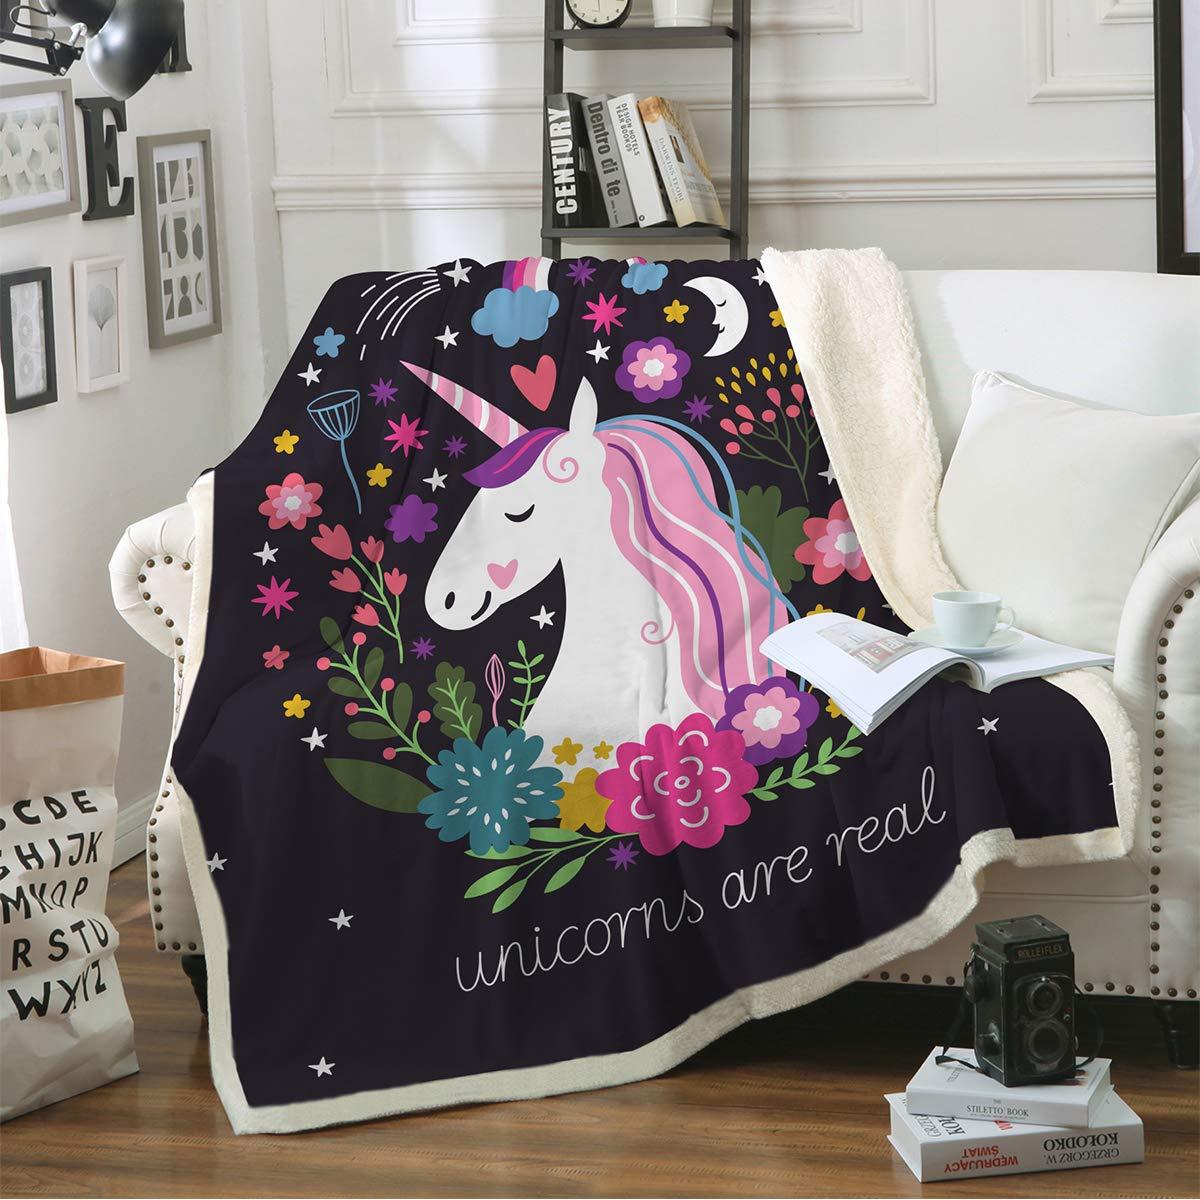 Sleepwish Cute Unicorn Blanket Girls Cartoon Unicorn with Flowers Fleece Blanket Black Sherpa Blanket for Kids Adults (Throw 50''x60'') by Sleepwish